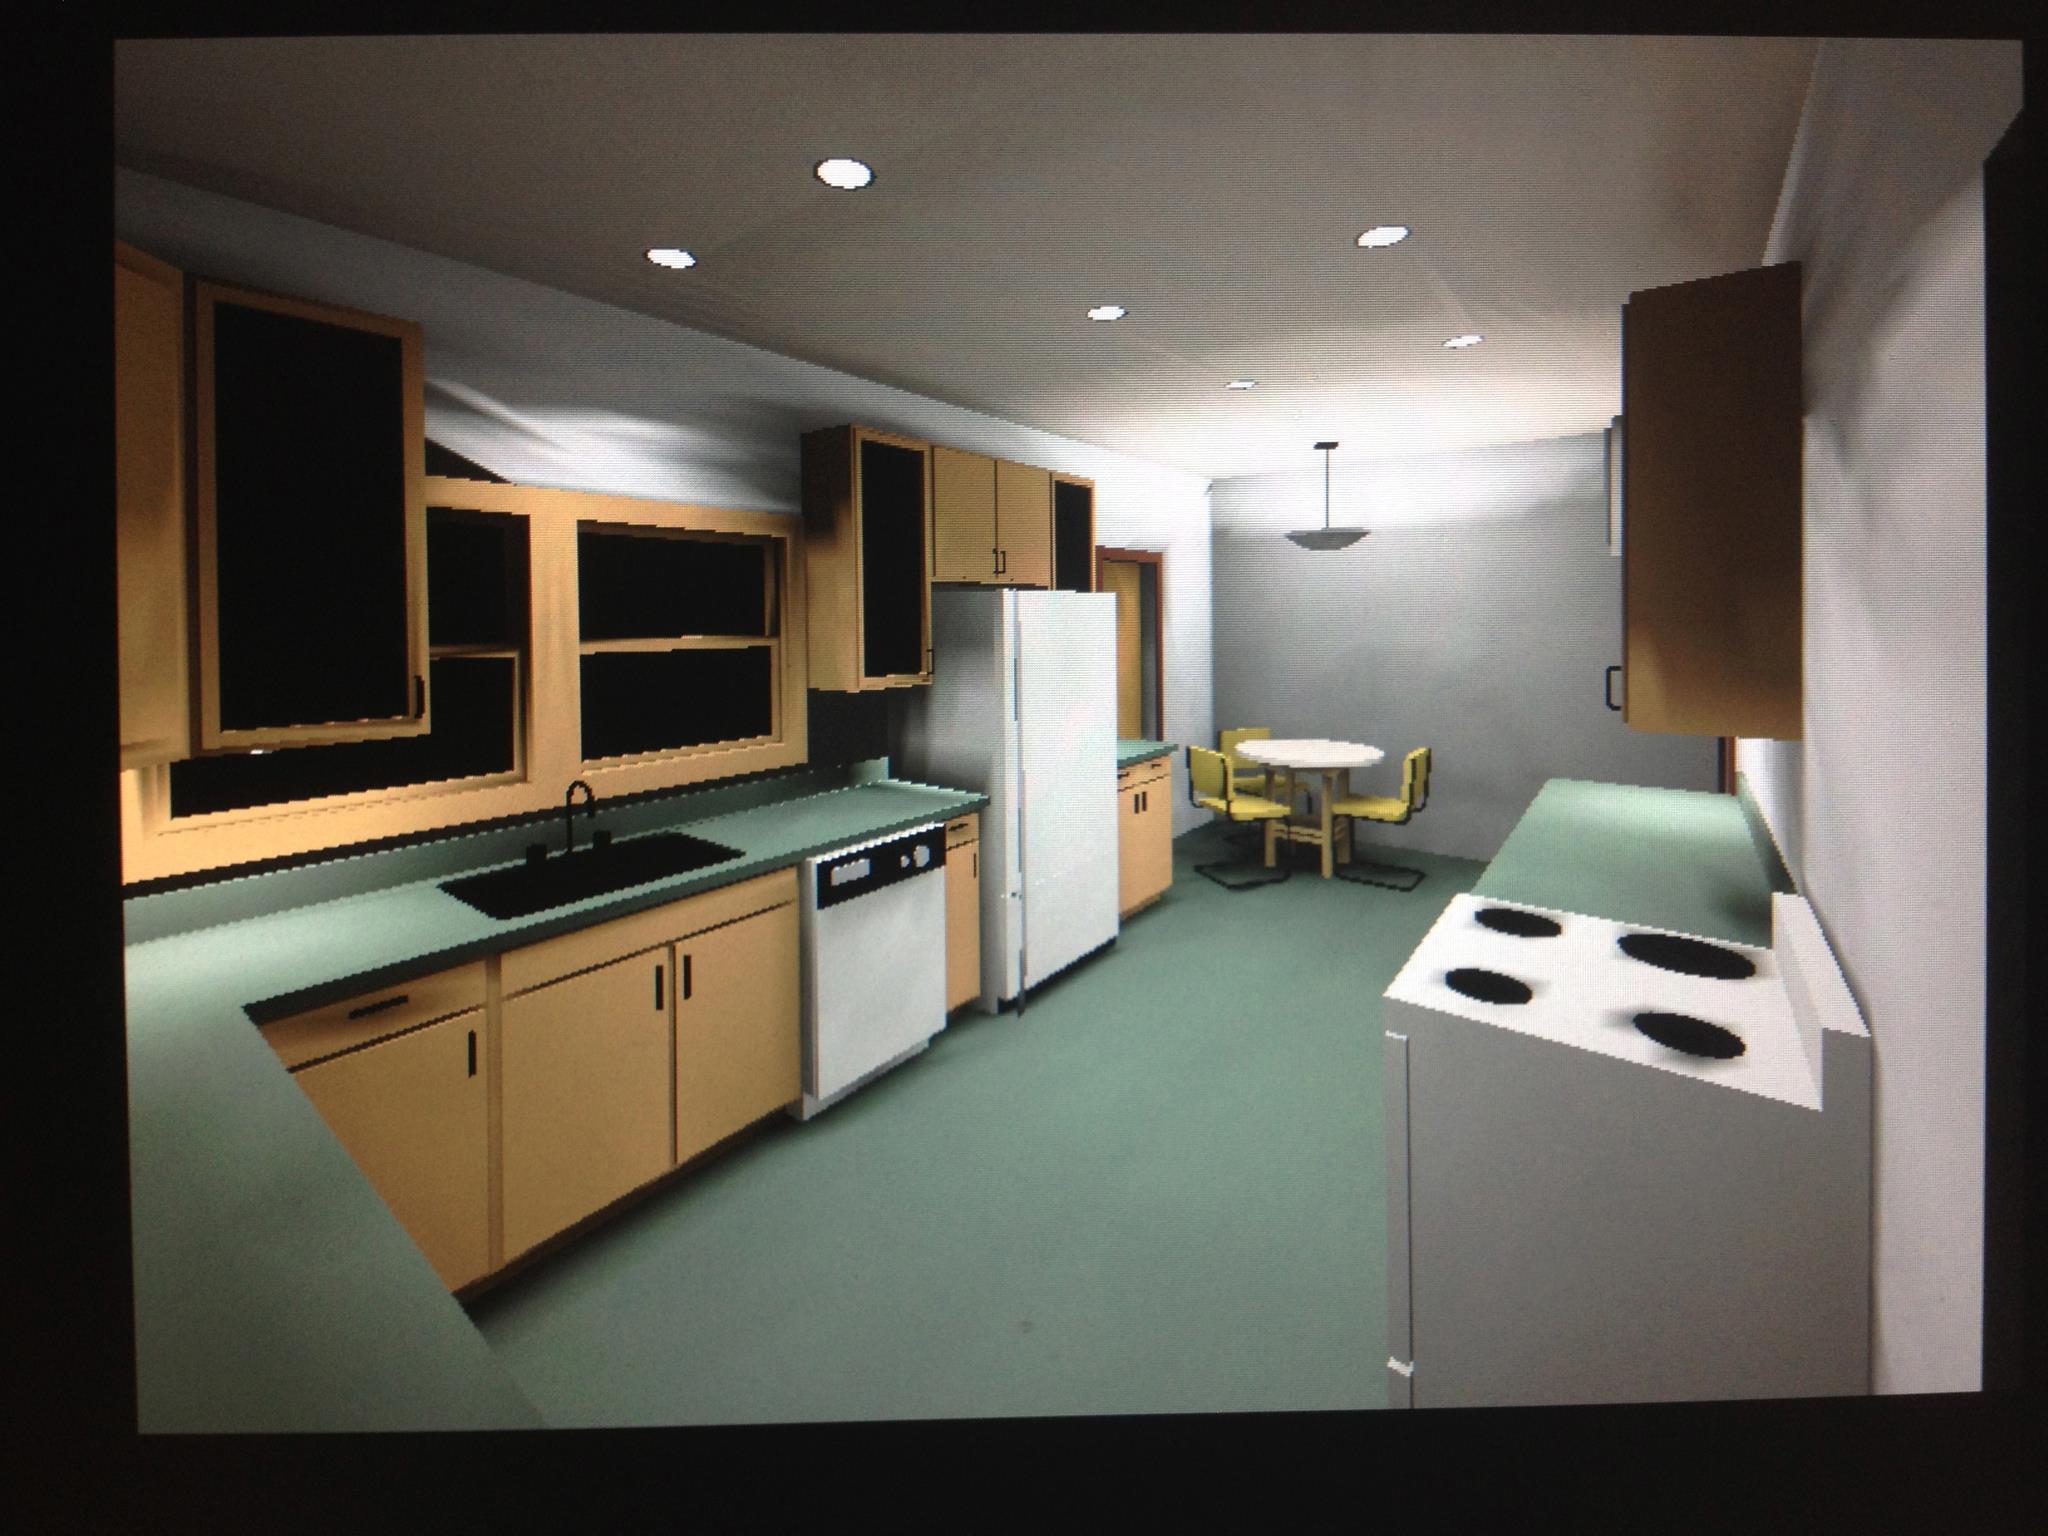 kitchen design tool ipad kitchen remodel app Kitchen Cabinet Design App Ipad Kitchen Design Apps Reviews App For Kitchen Design designalicio us